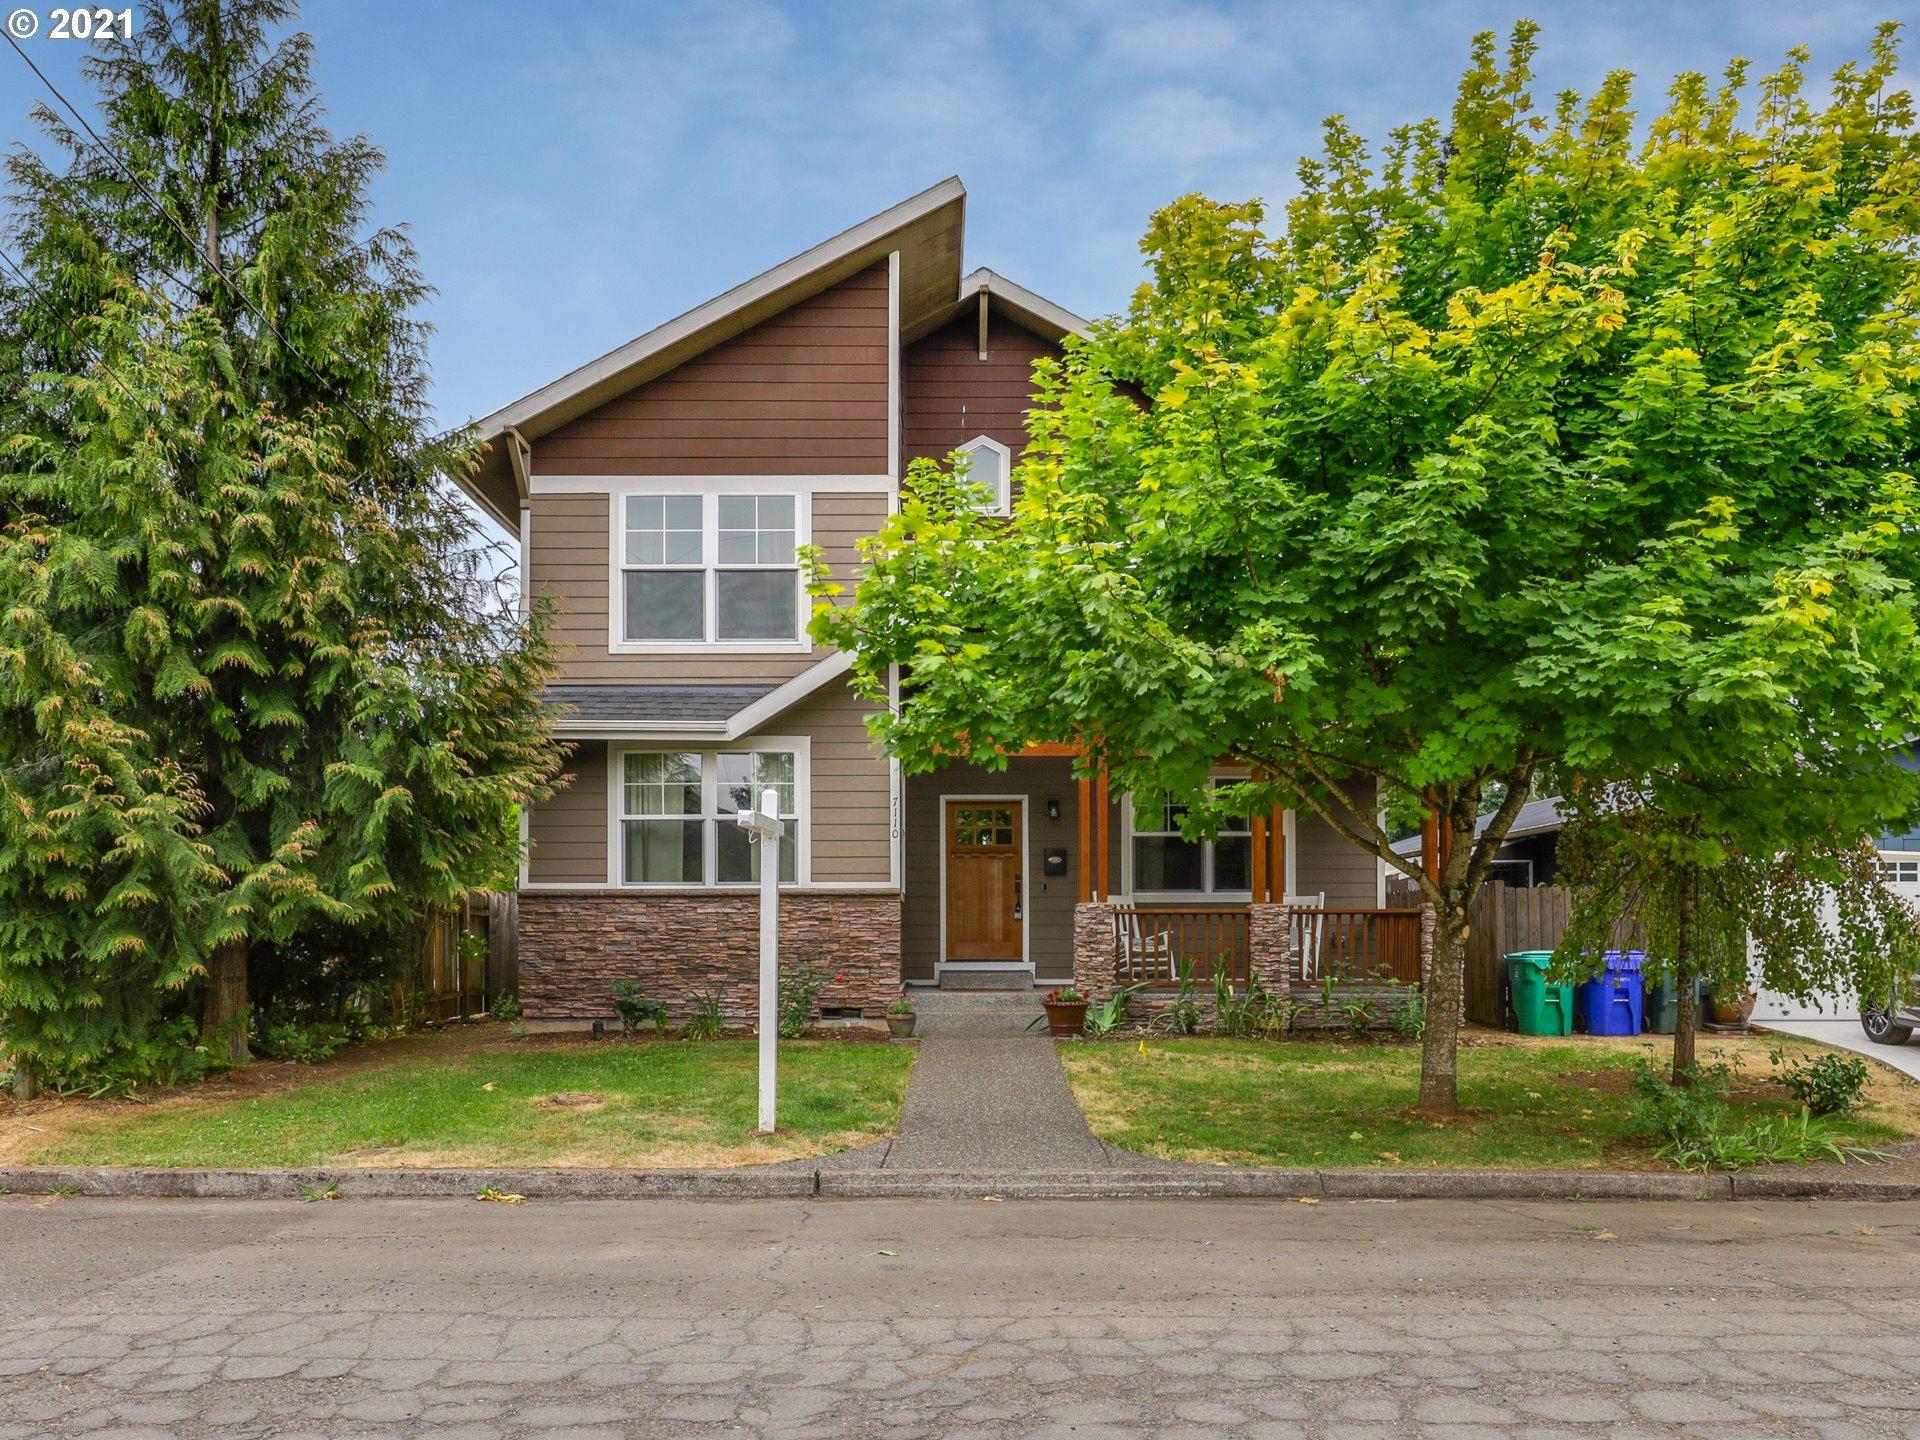 7110 SE GLADSTONE ST, Portland, OR 97206 - MLS#: 21062505